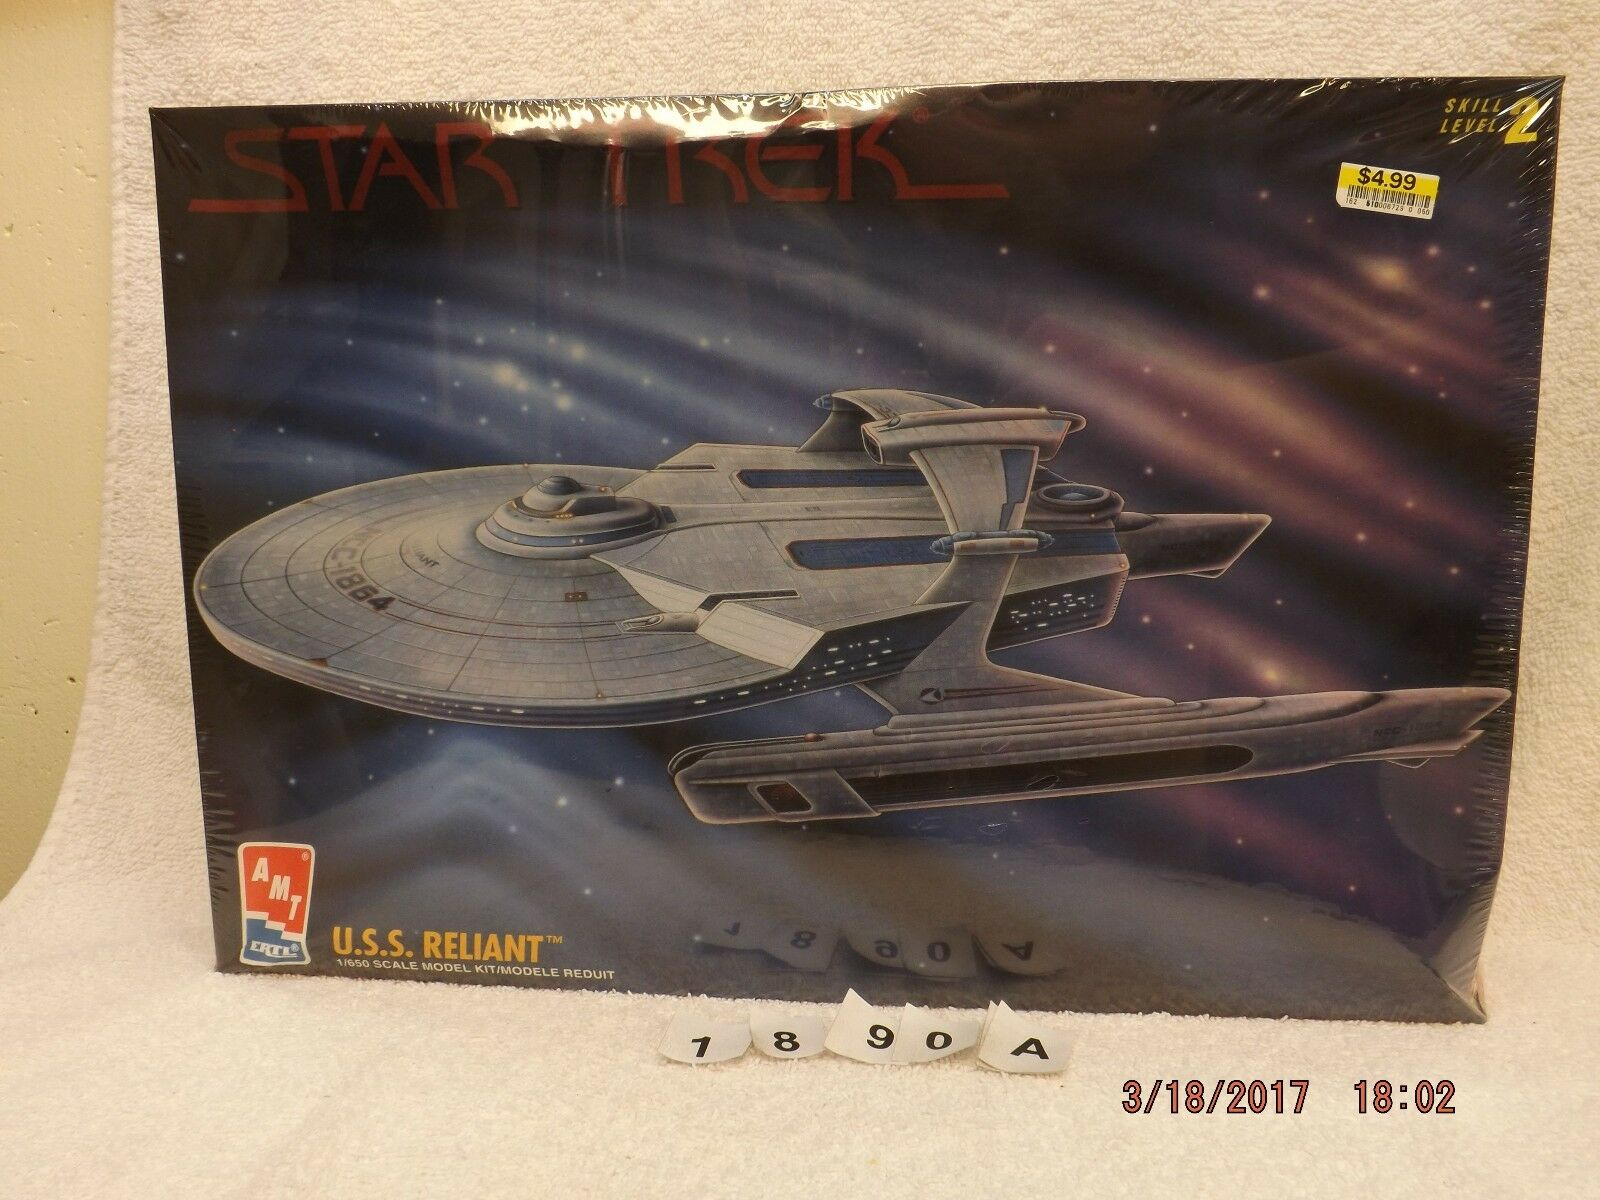 Star Trek The Wrath of Khan USS Reliant AMT ERTL 1995 MIB